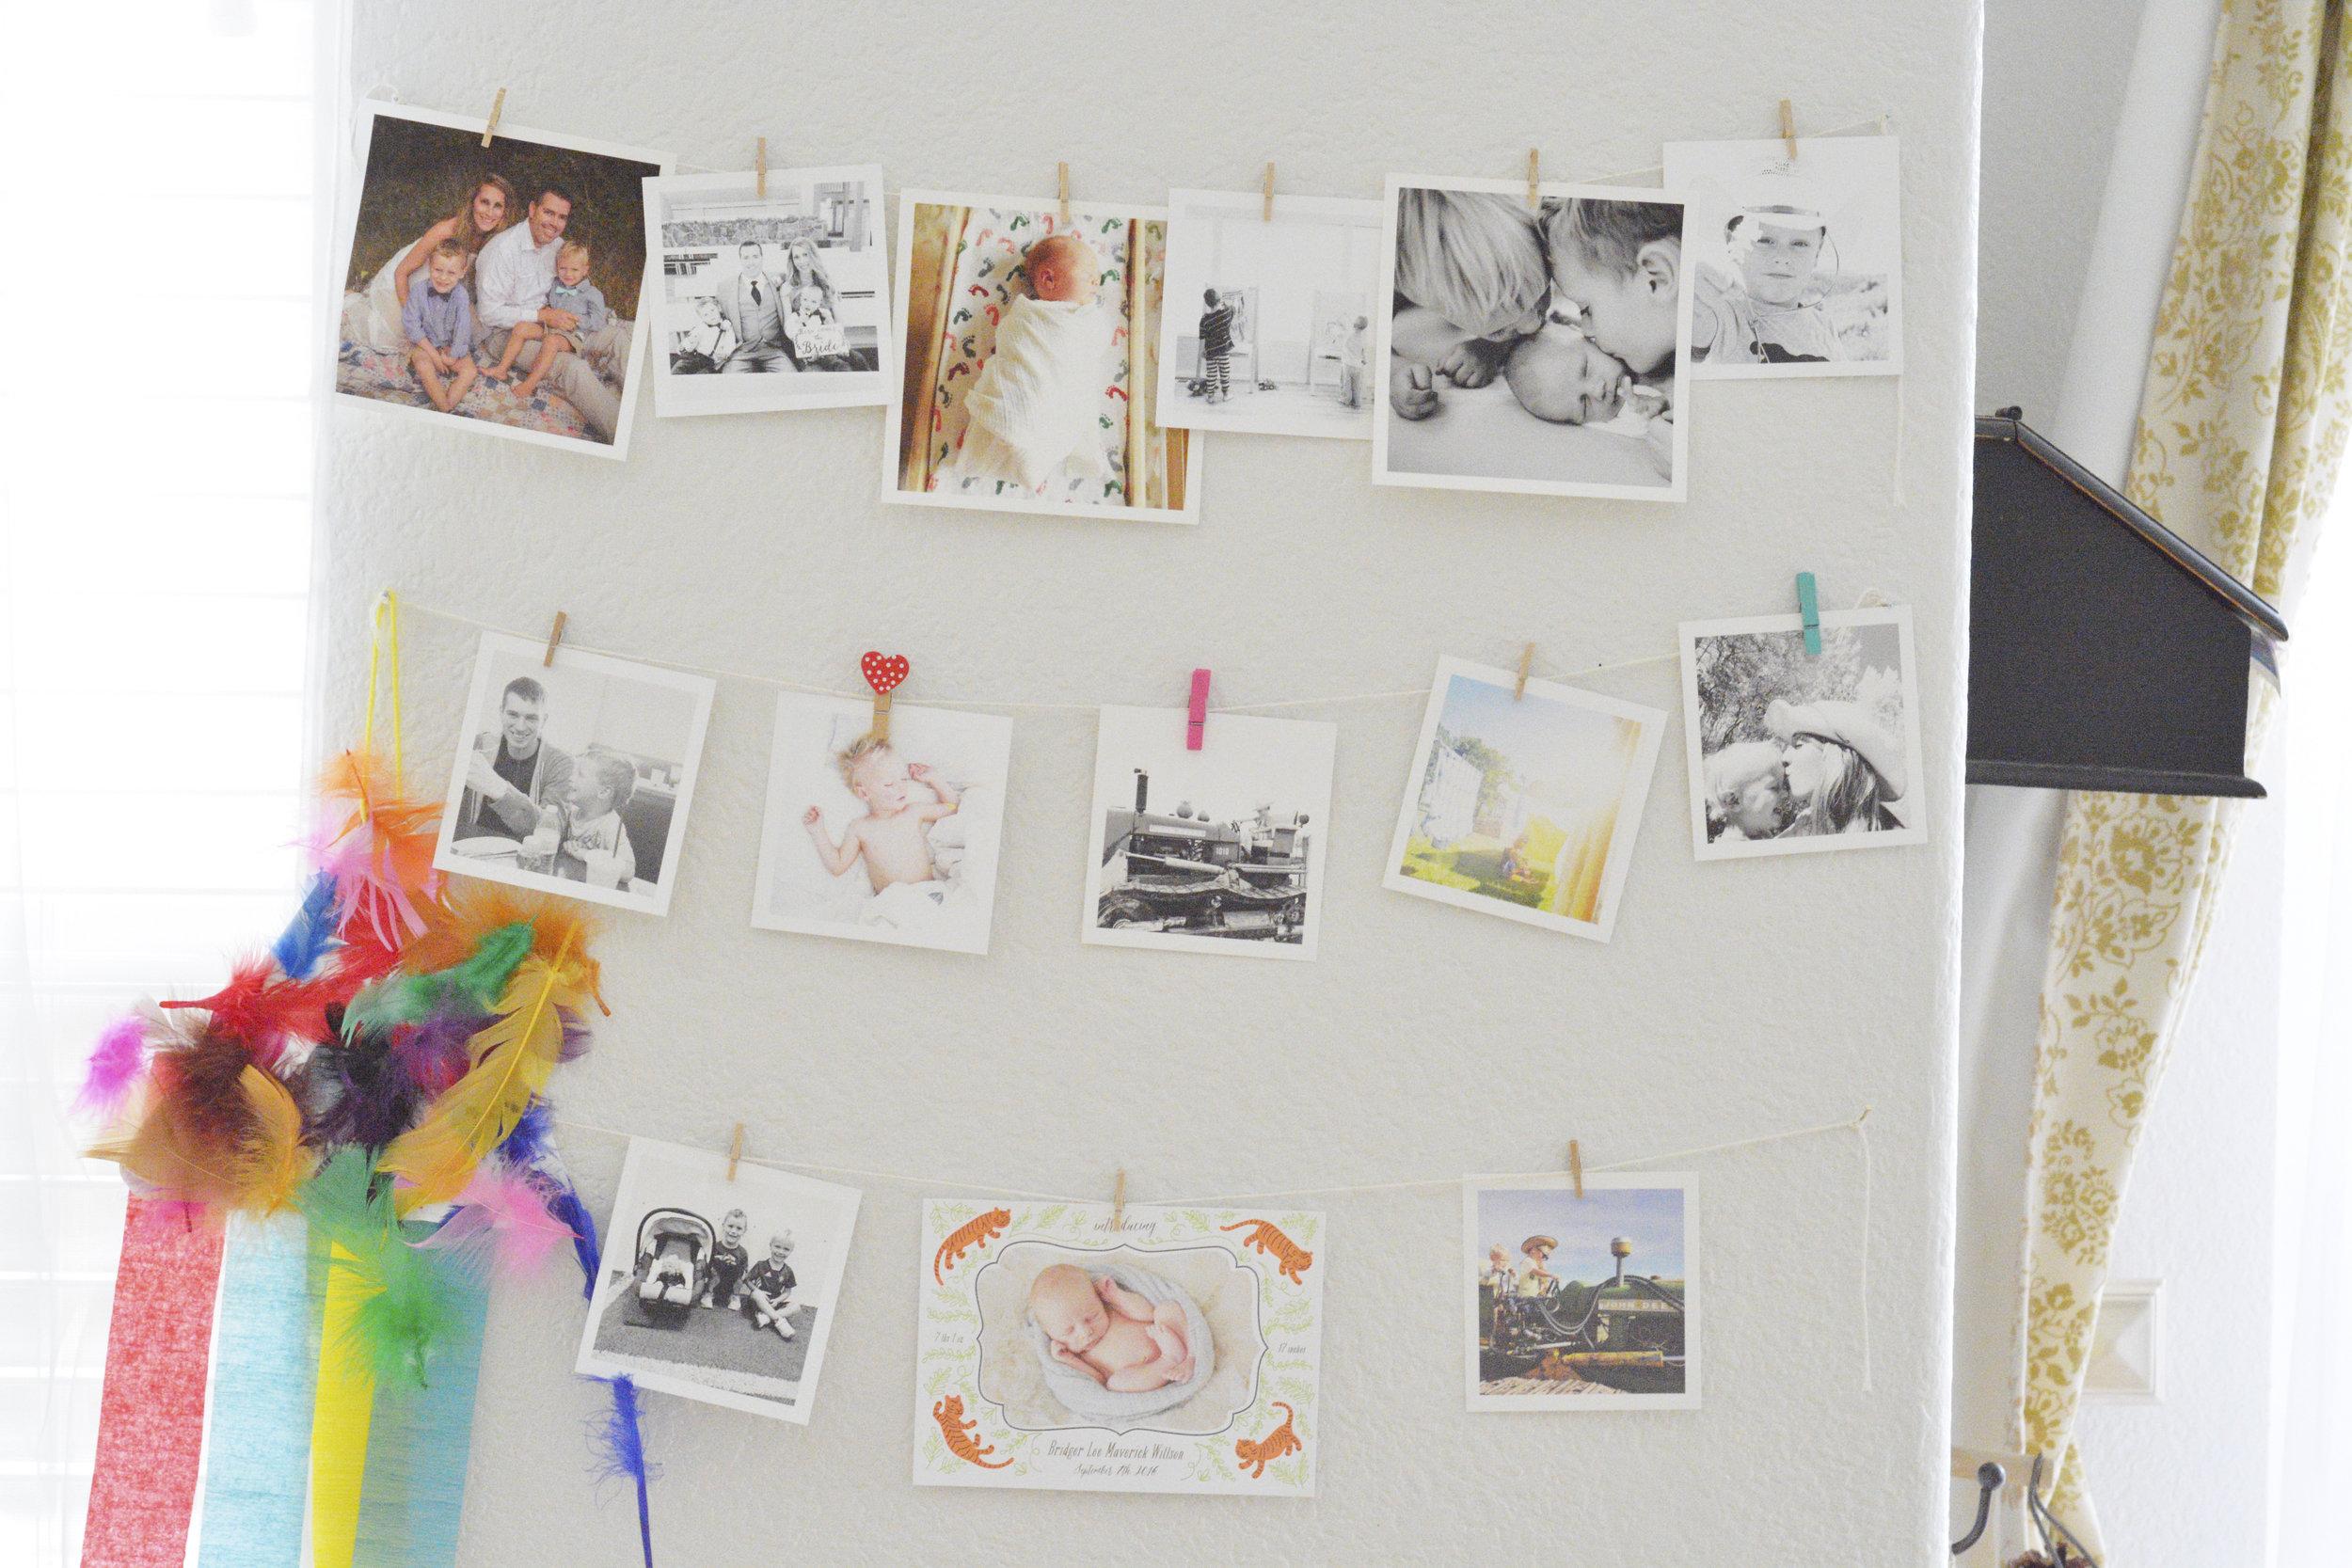 Square photo prints with Parabo Press